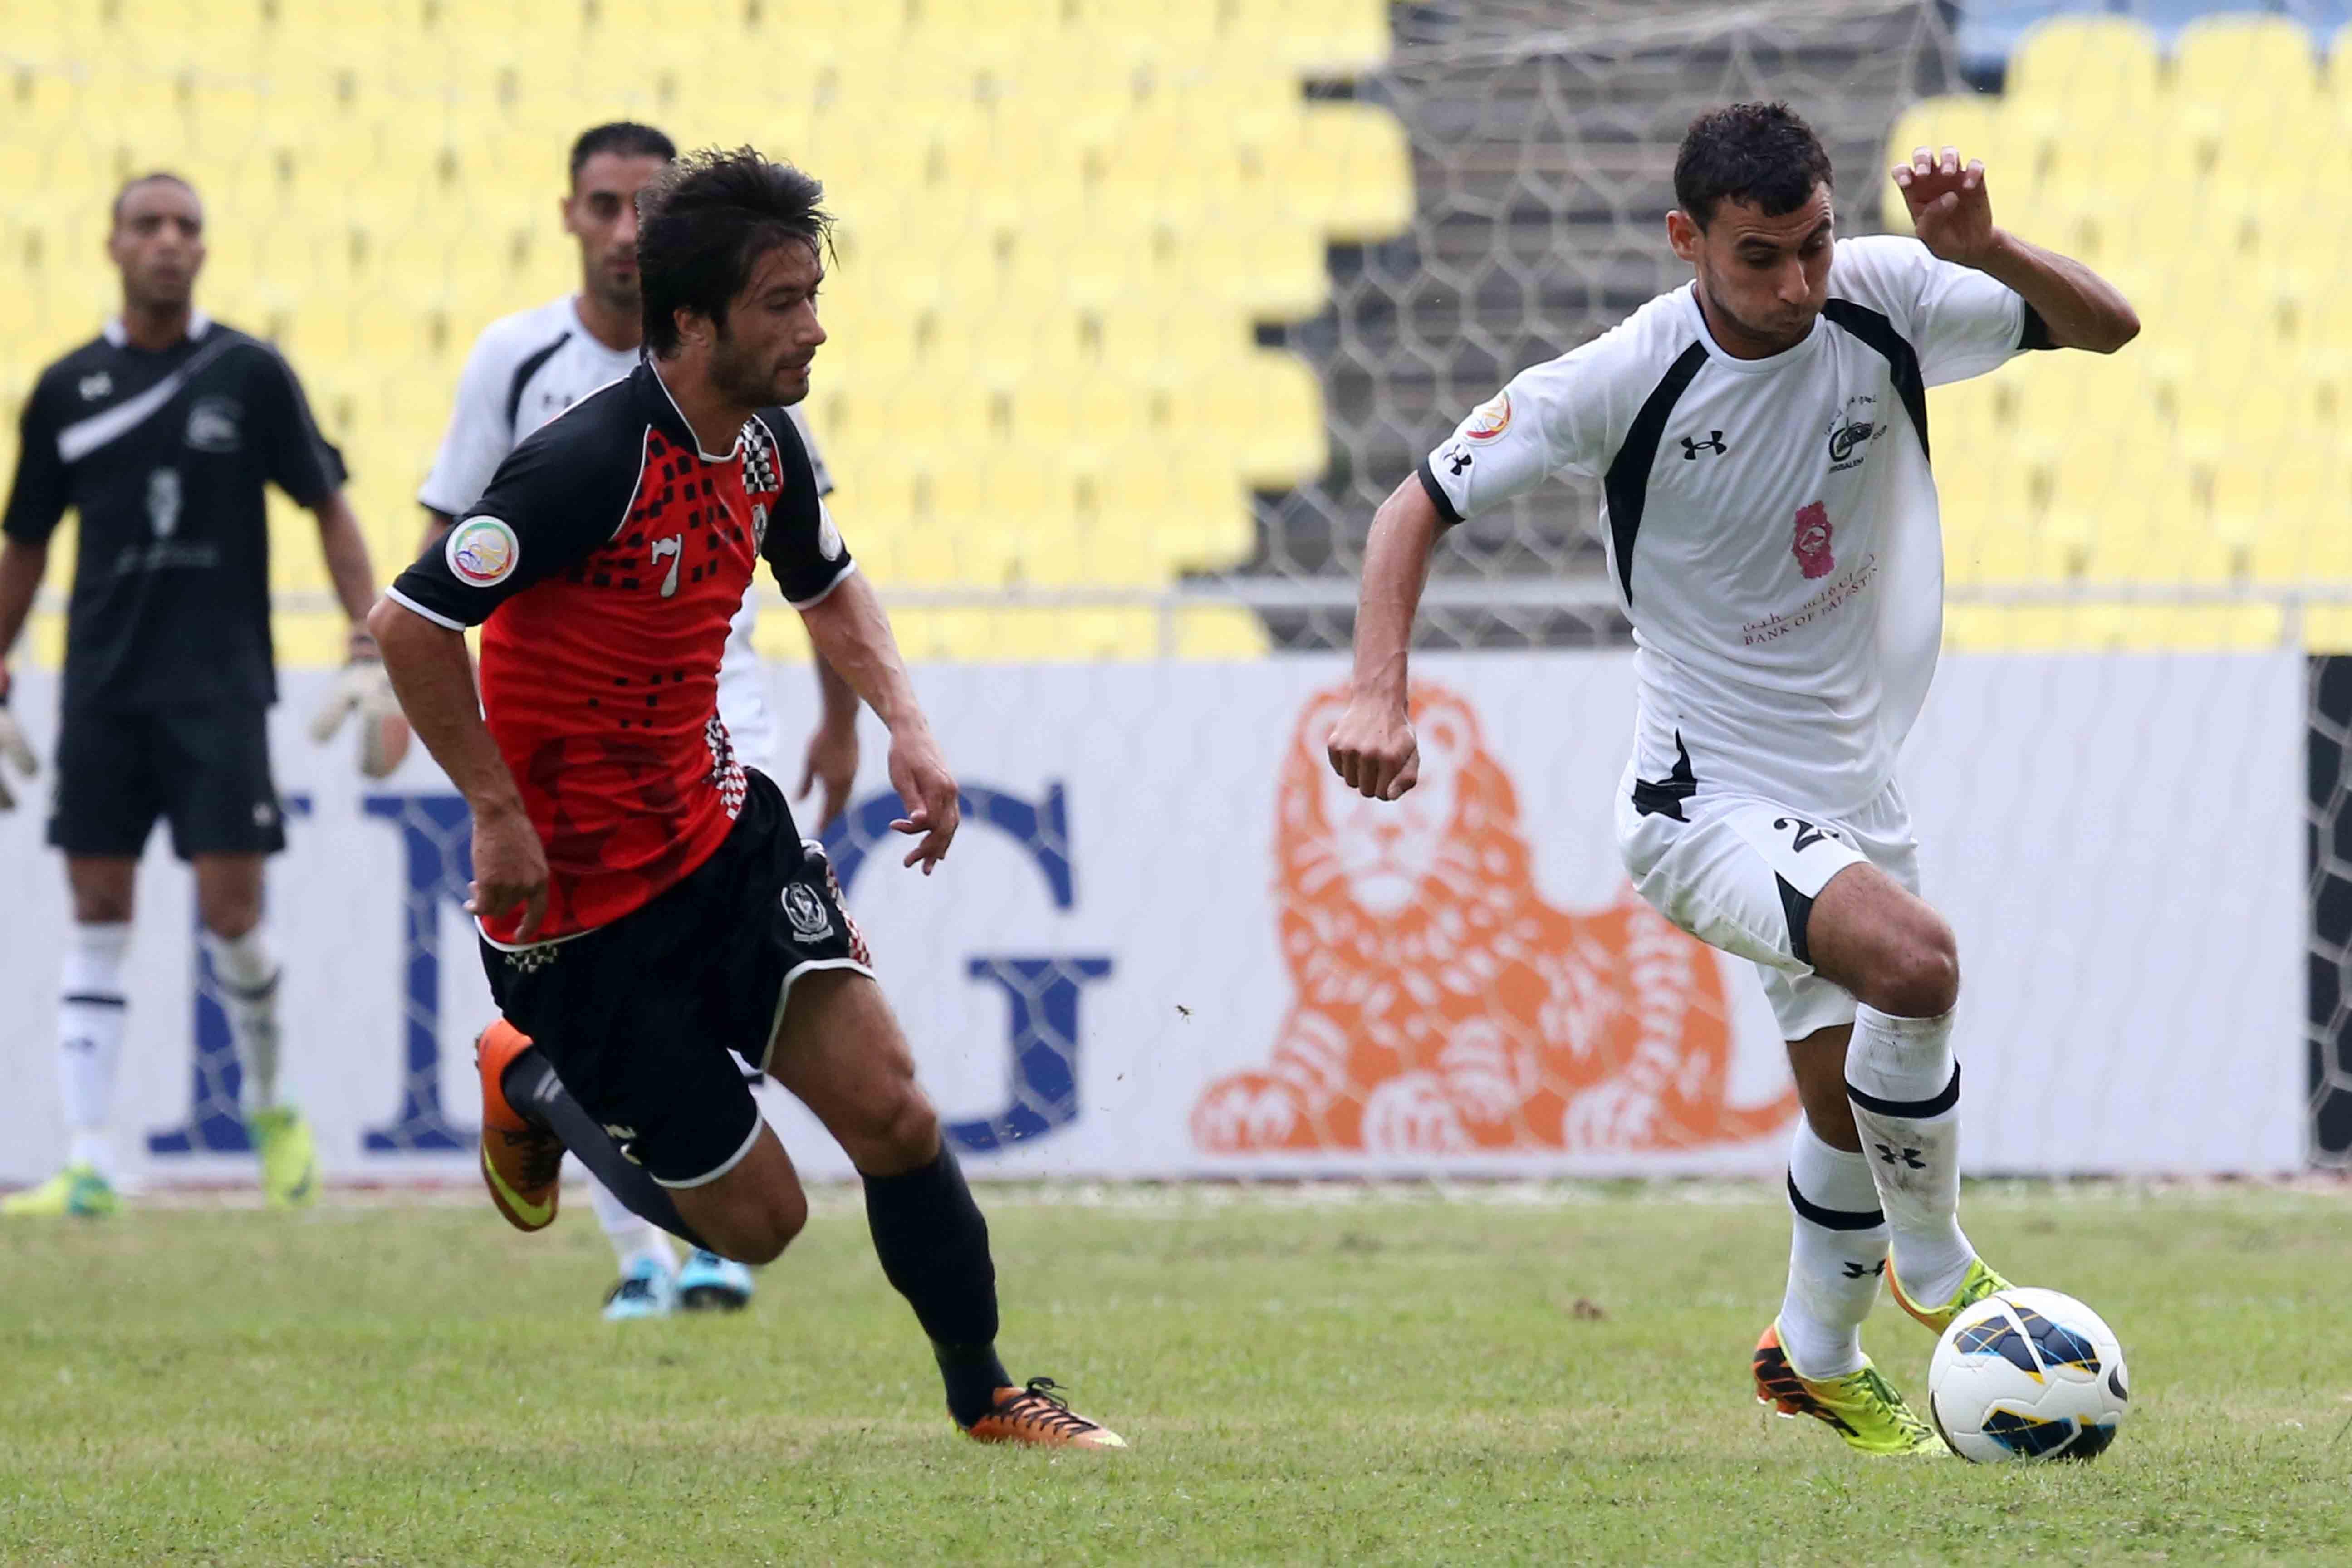 Pictures: AFC President's Cup – KRL vs. Hilal Al-Quds